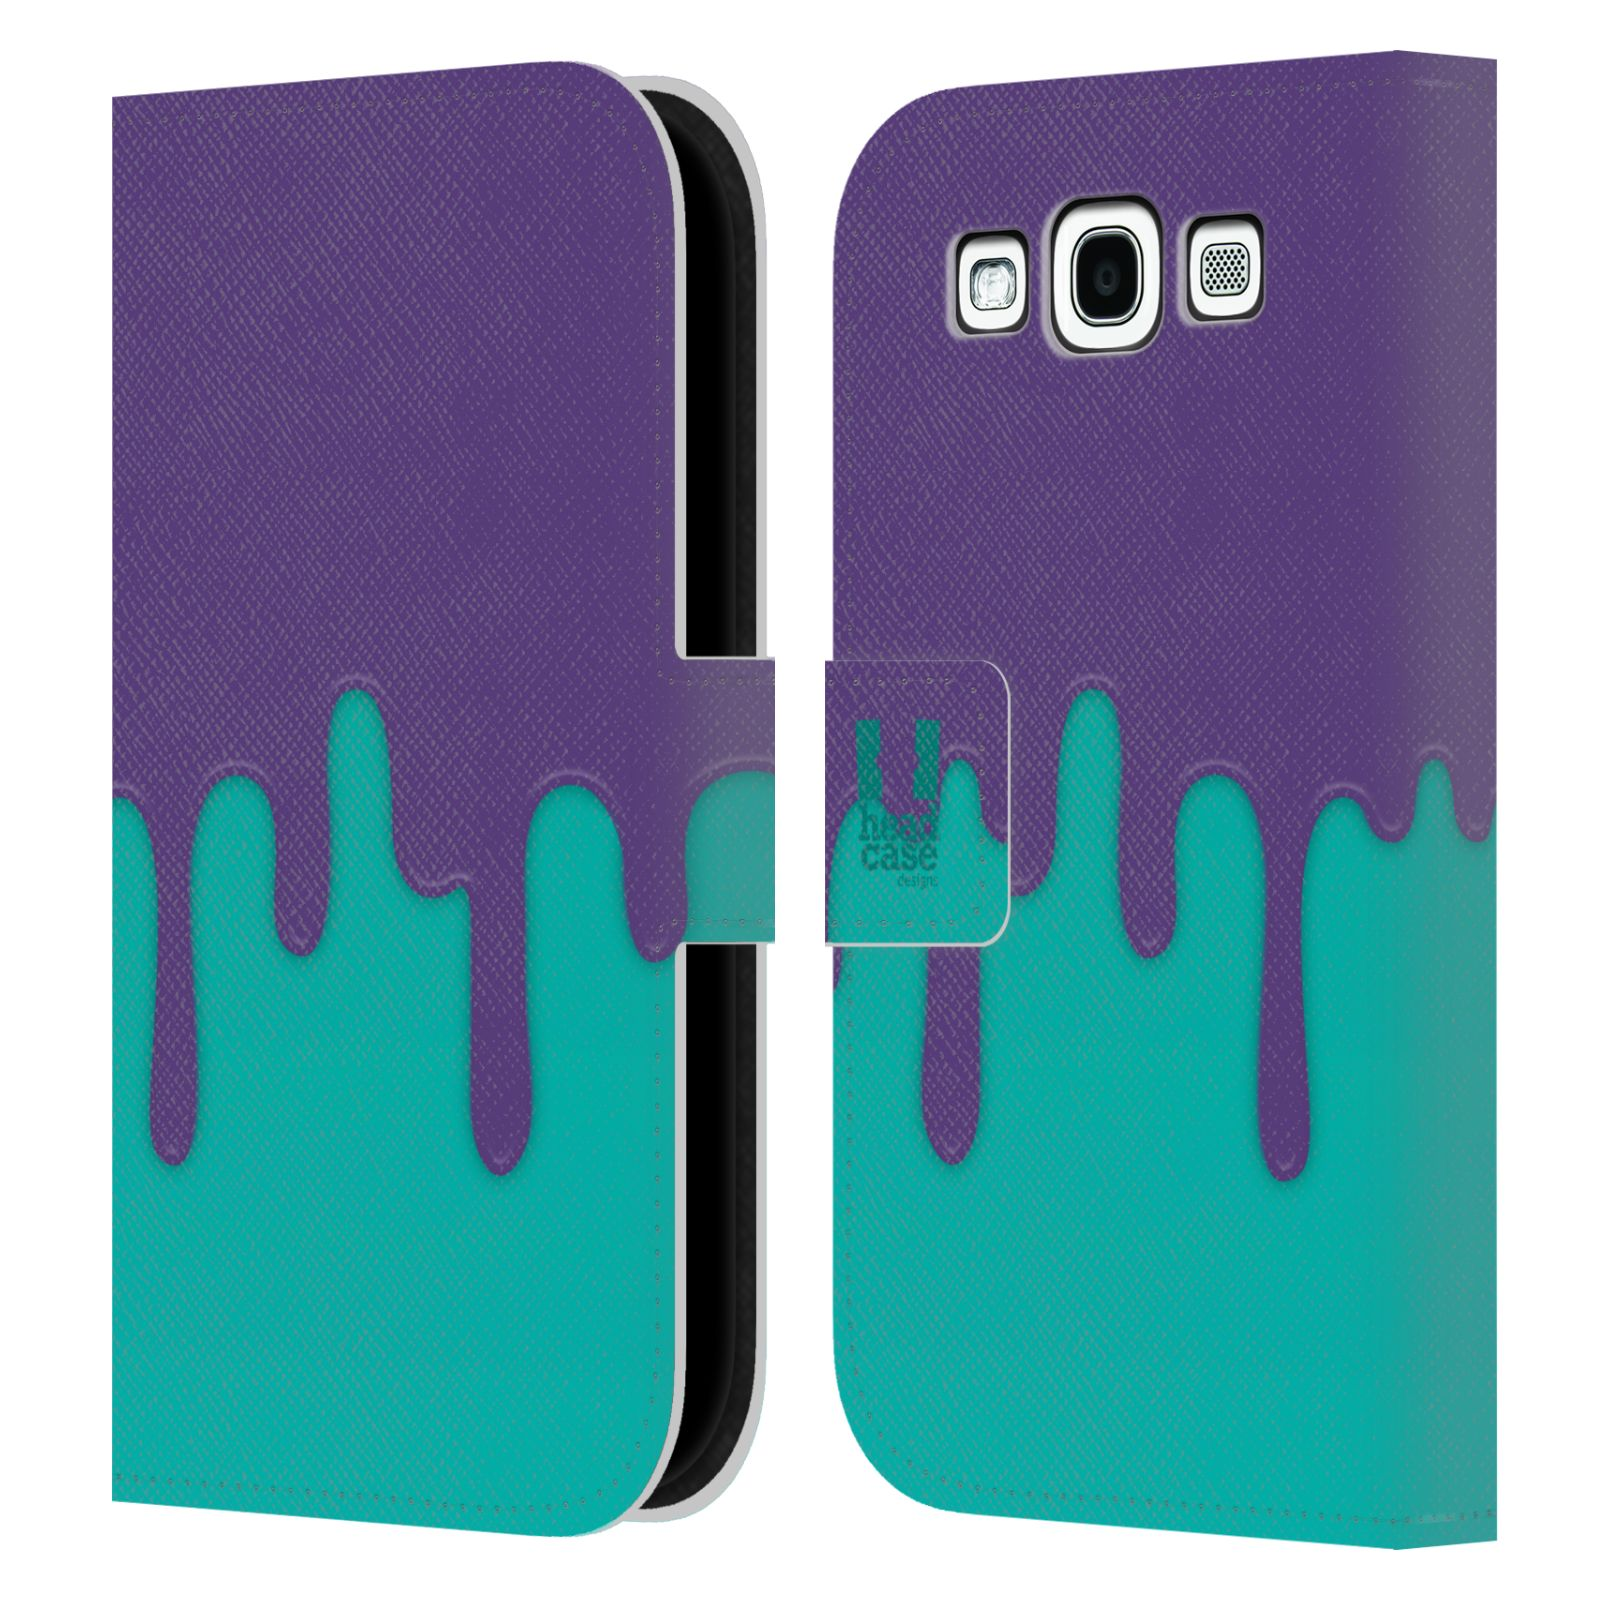 HEAD CASE Flipové pouzdro pro mobil Samsung Galaxy S3 Rozlitá barva fialová a tyrkysová